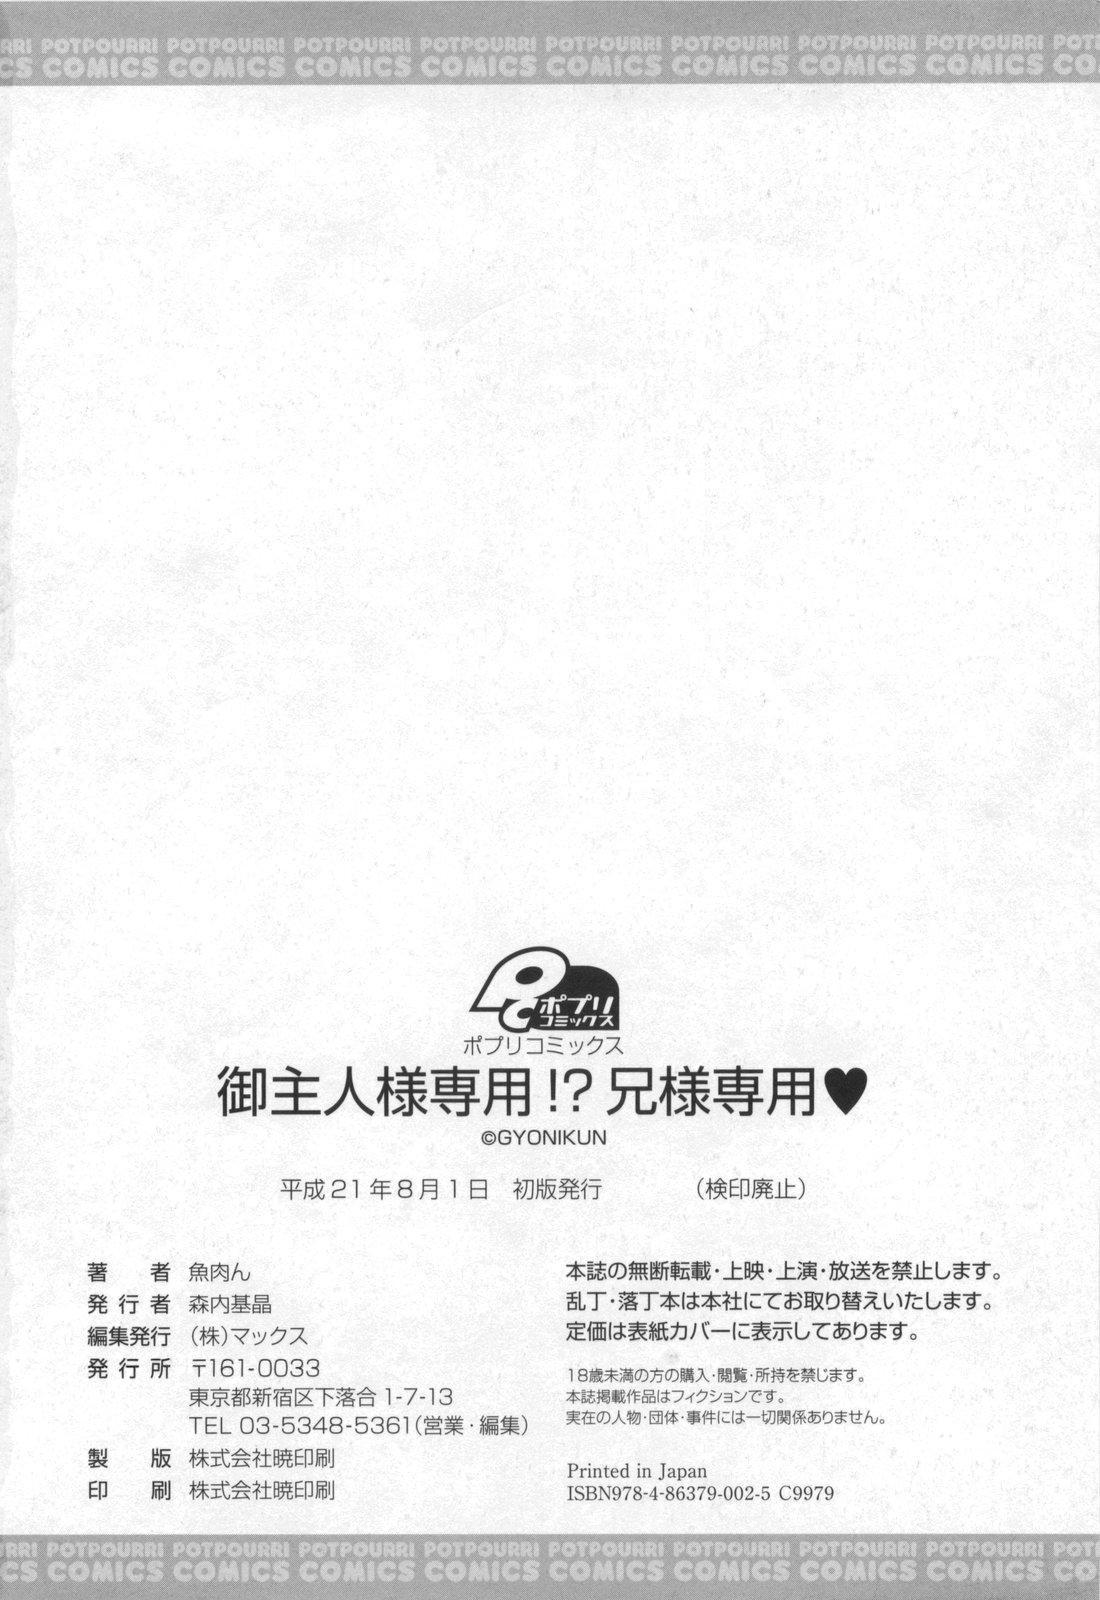 [Gyonikun] Gosyujin-sama Senyou!? Ami-sama Senyou 201